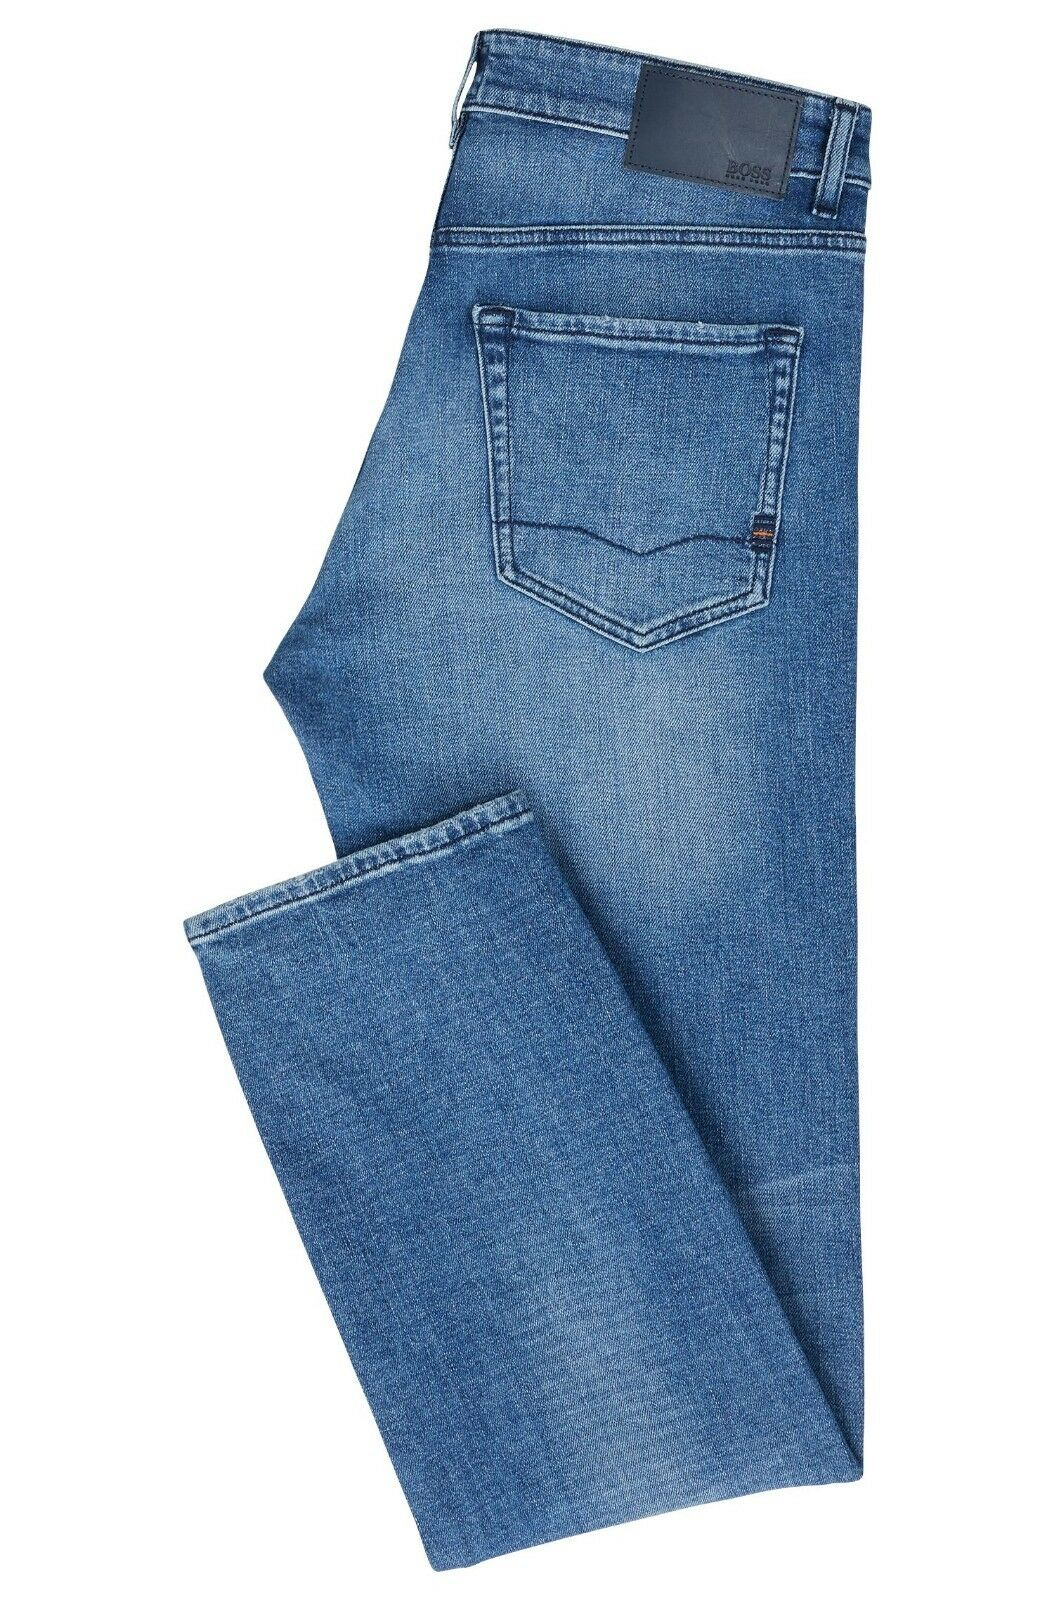 Hugo Boss Maine Bc-C Reguläre Reguläre Reguläre Passform Jeans in Comfort-Stretch Stonewashed 254893